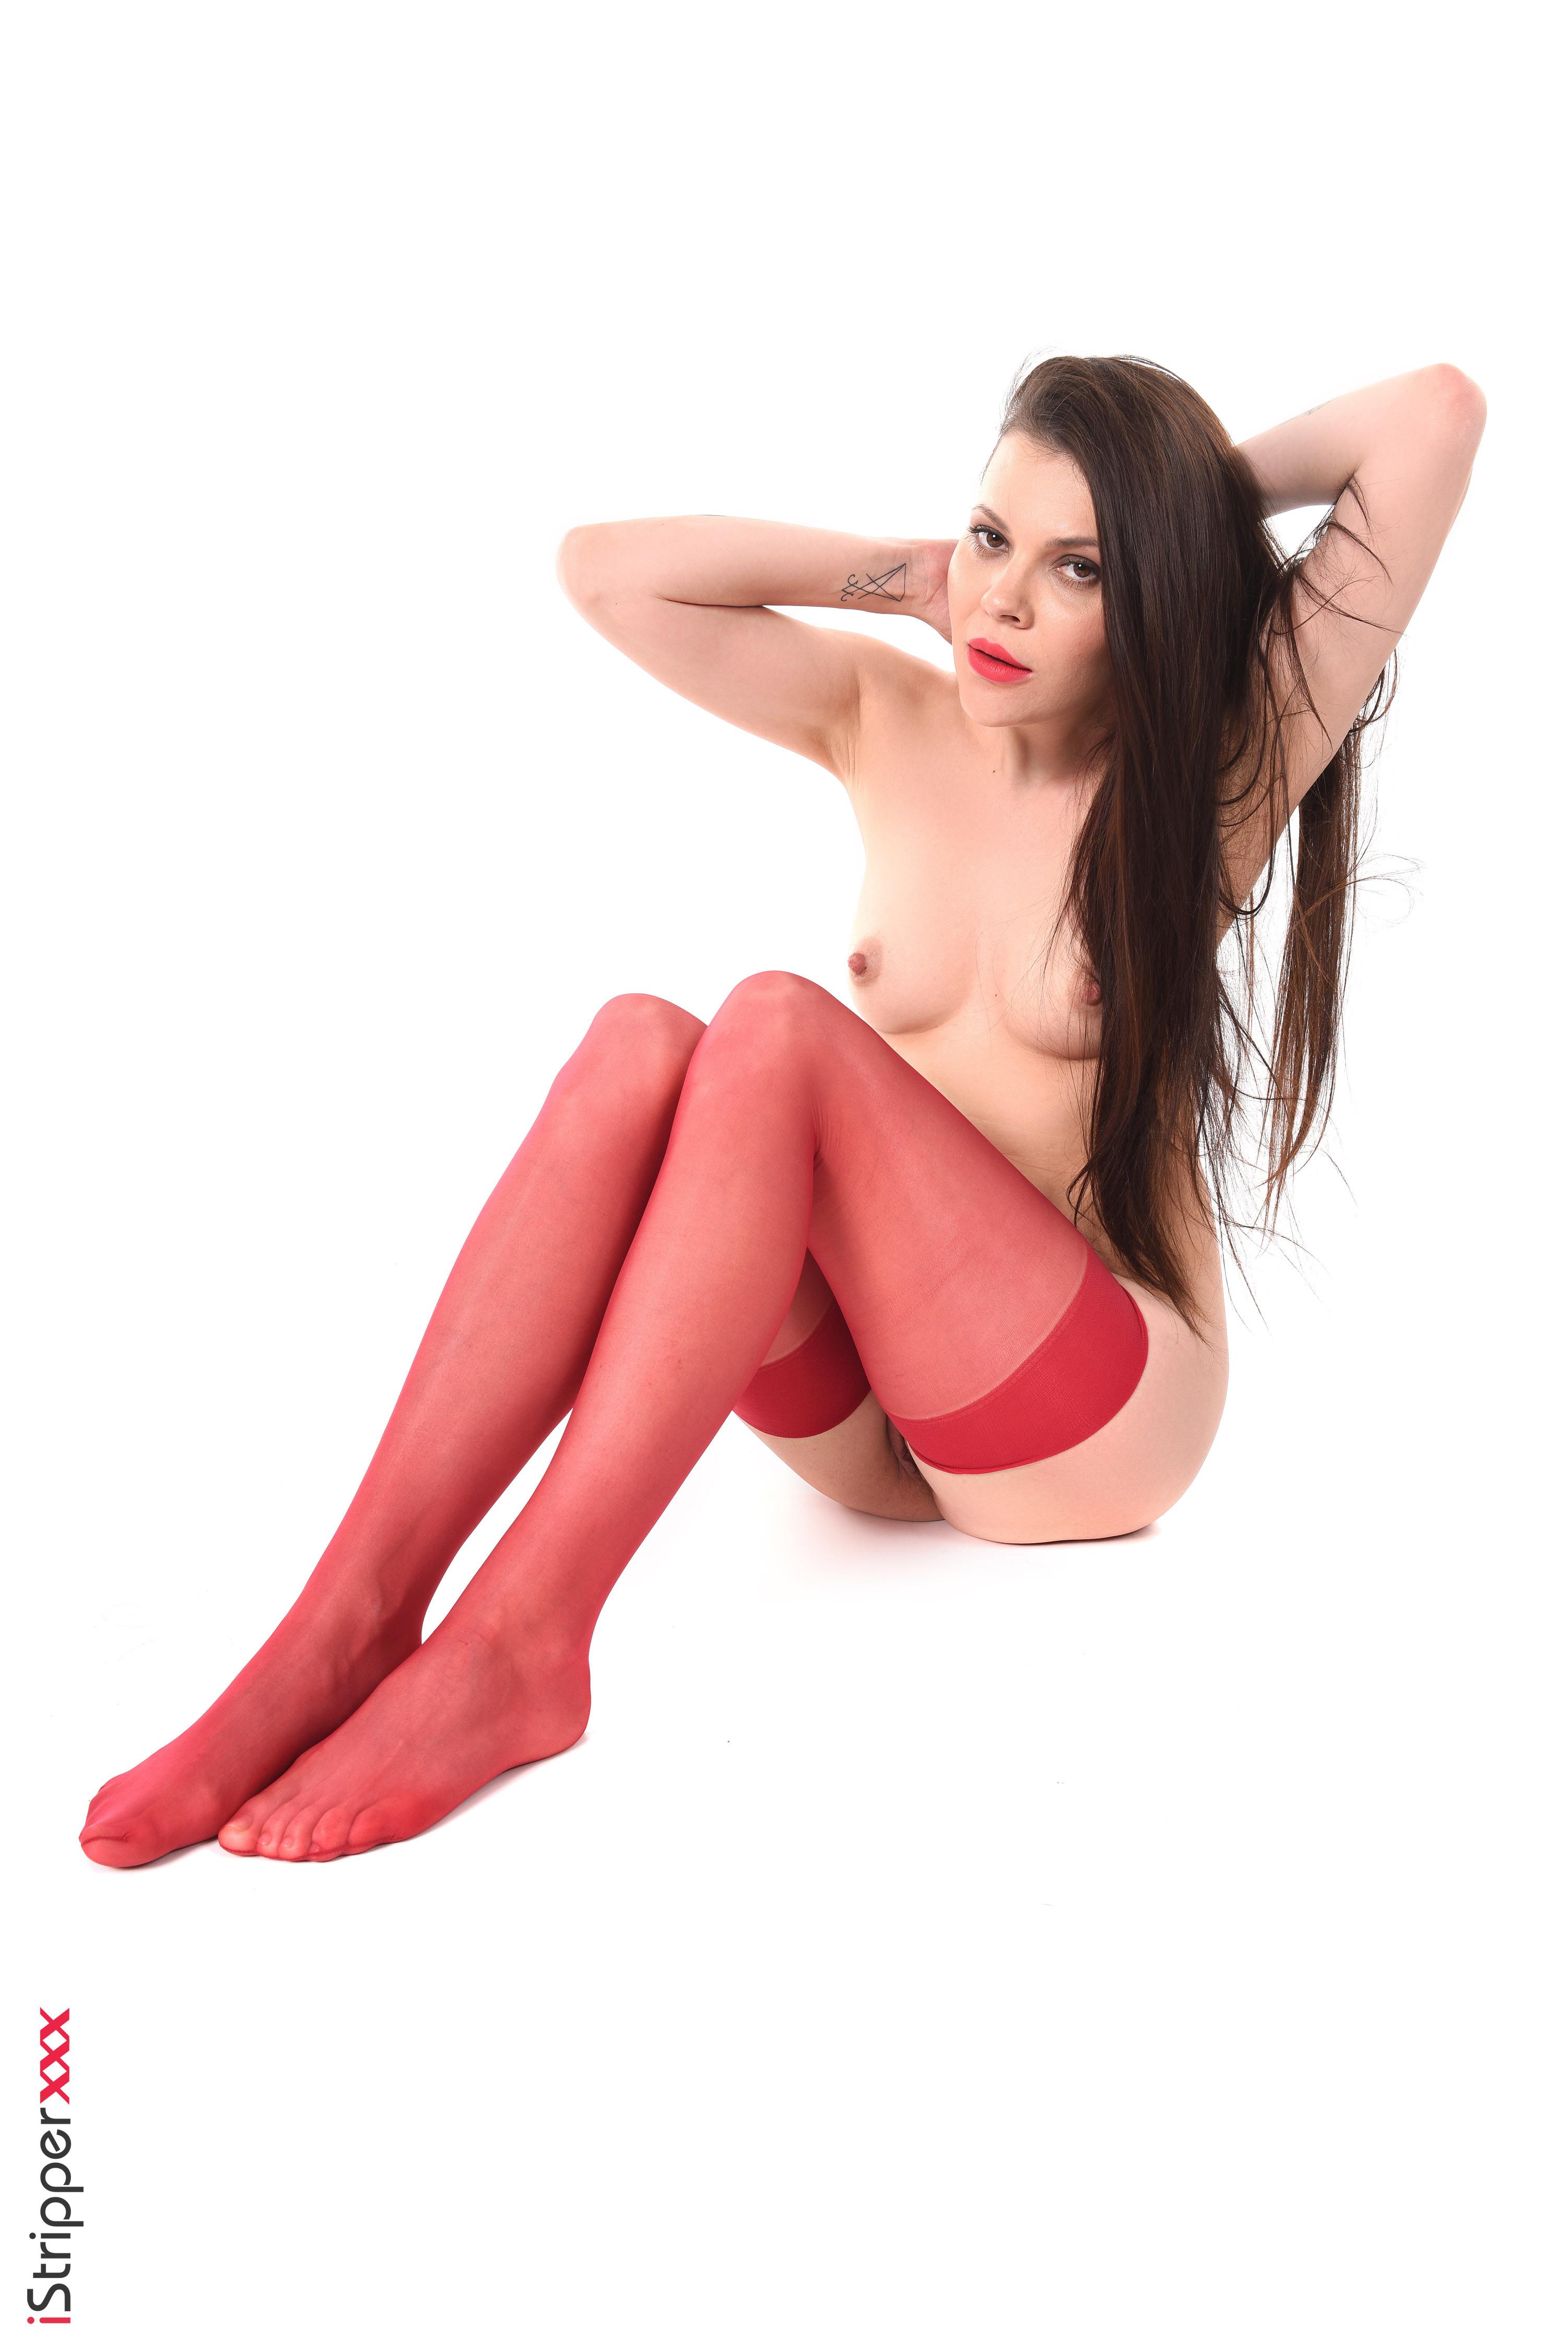 chloe james sexy striptease nude pleasures her twat by the pool pornhub